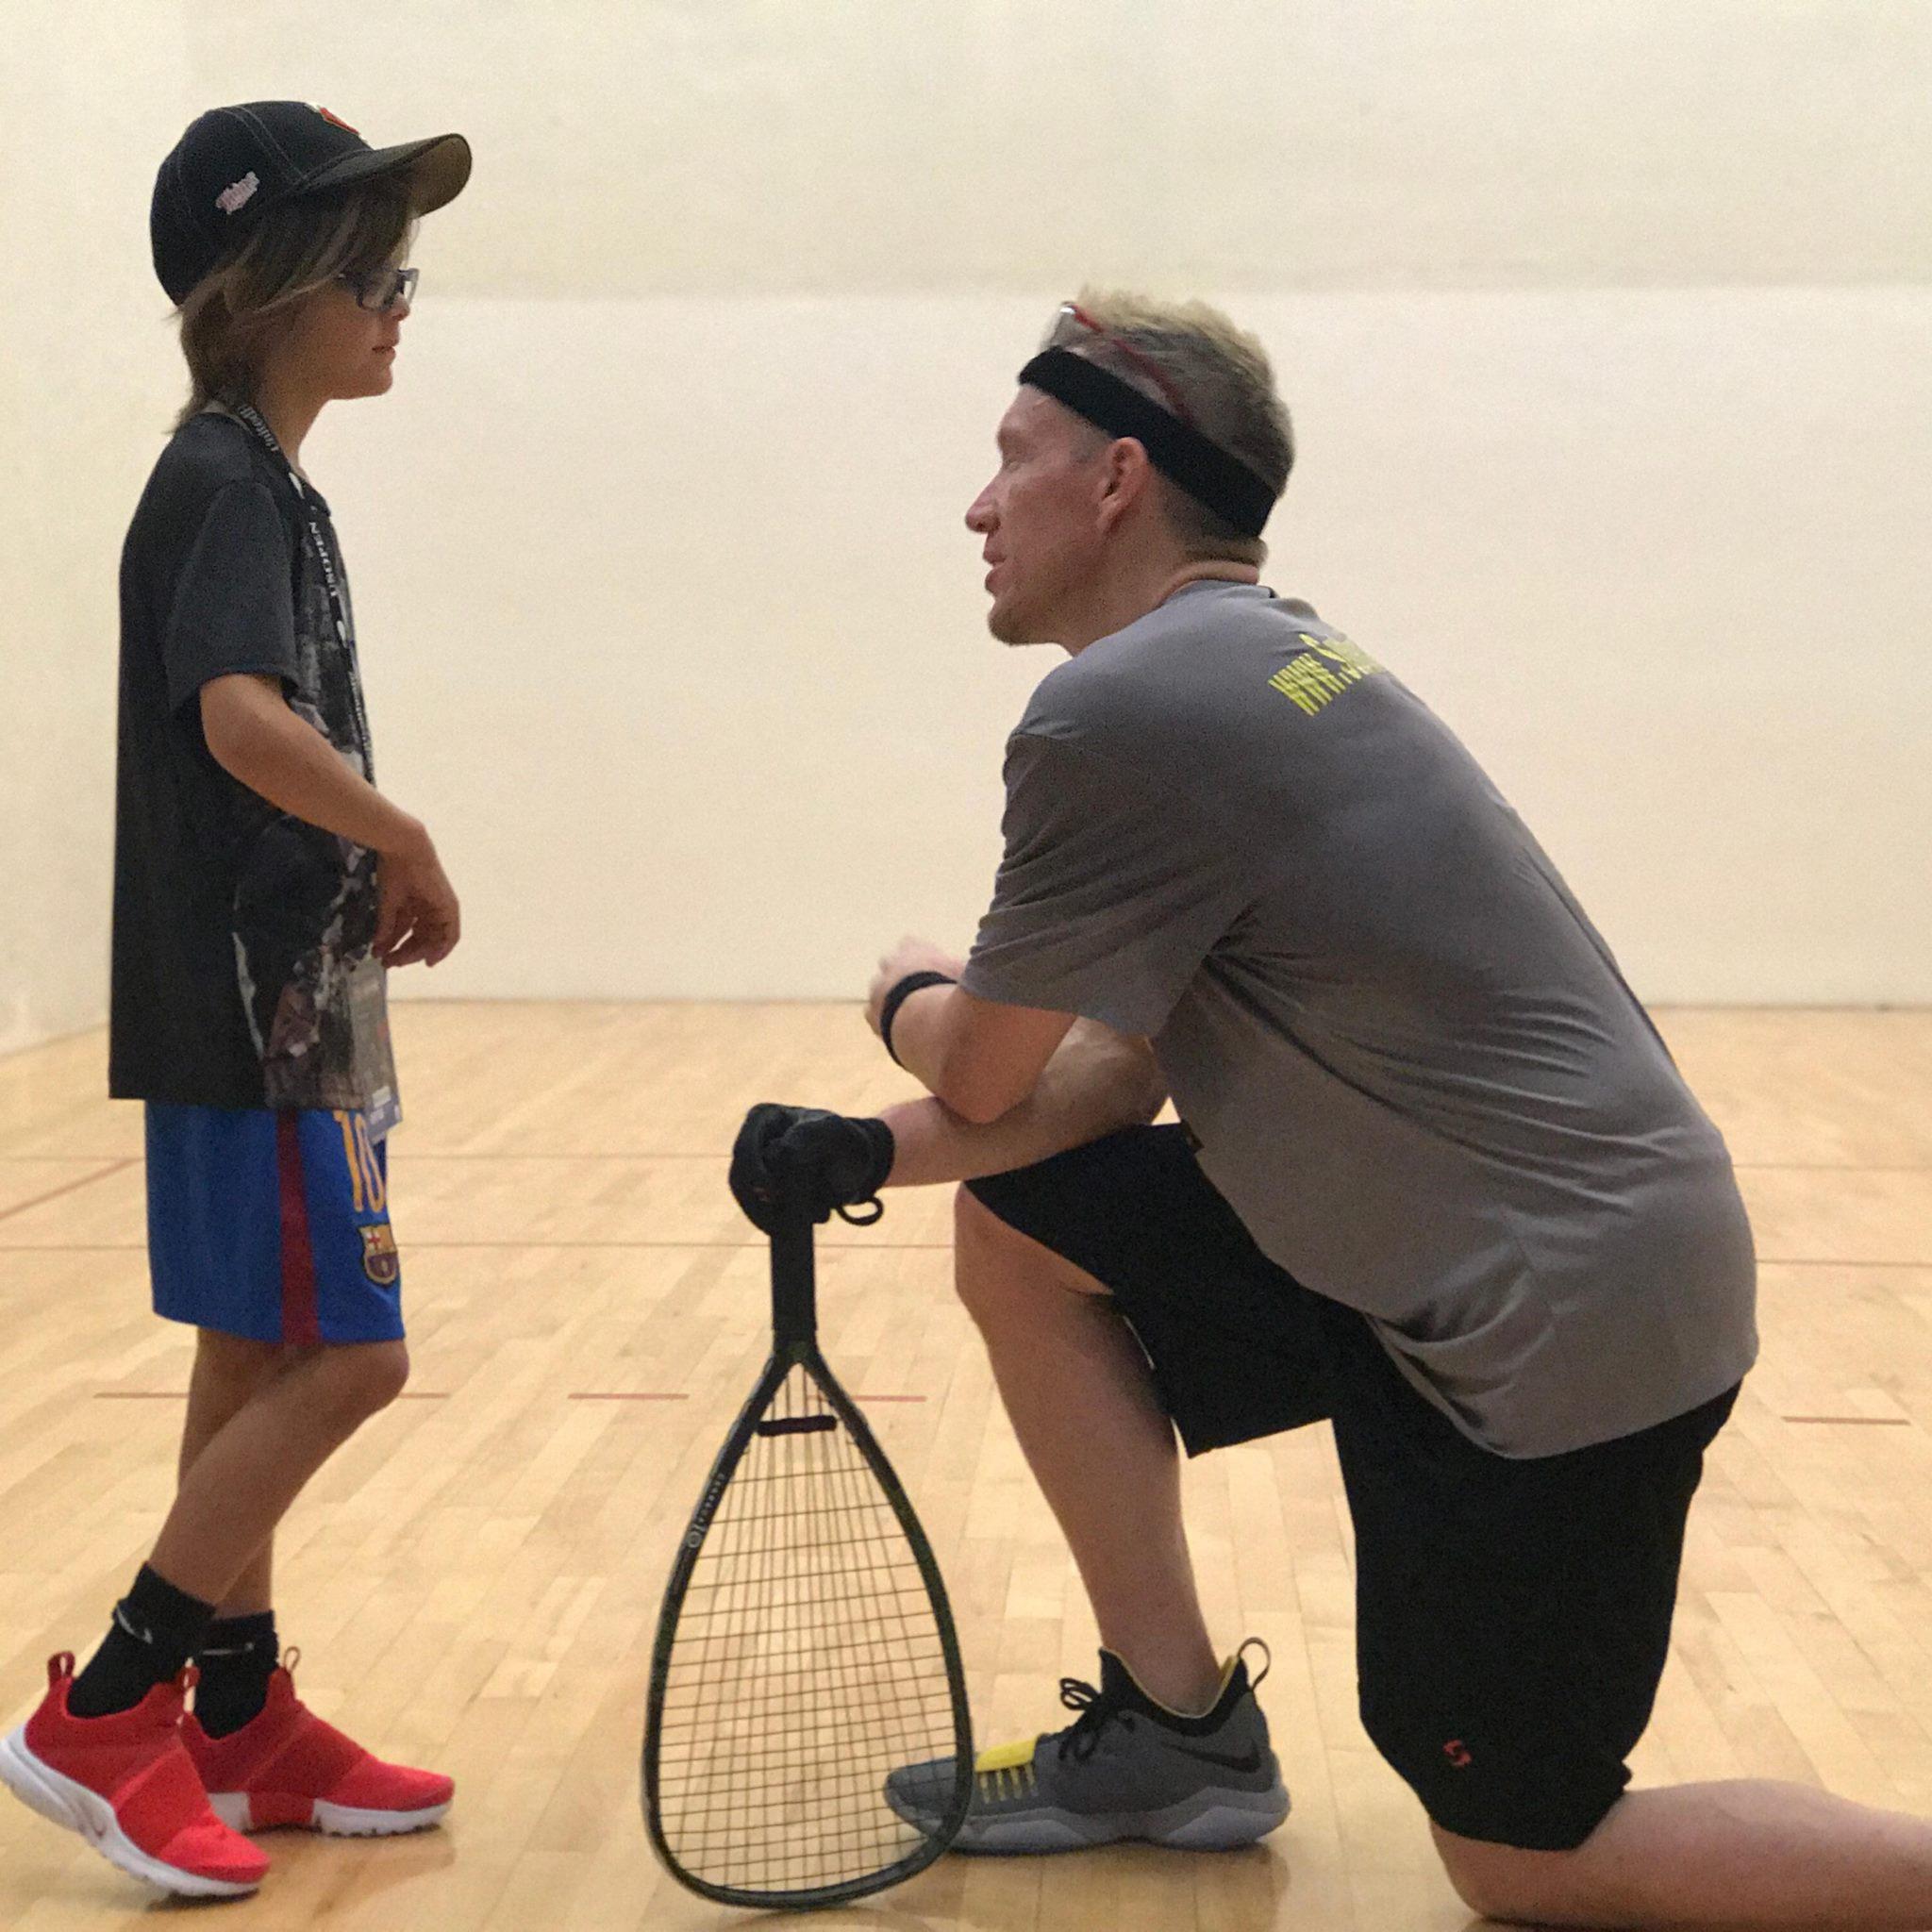 Sudsy Monchik Racquetball Coach